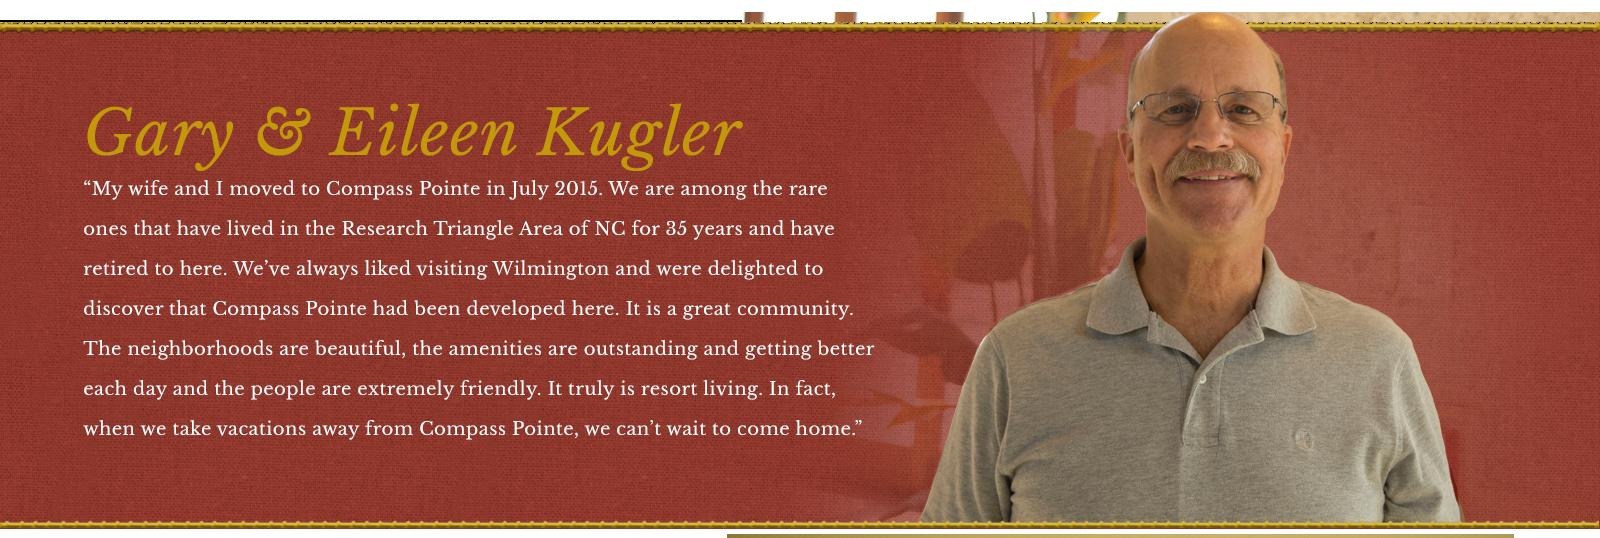 Gary and Eileen Kugler Testimonial